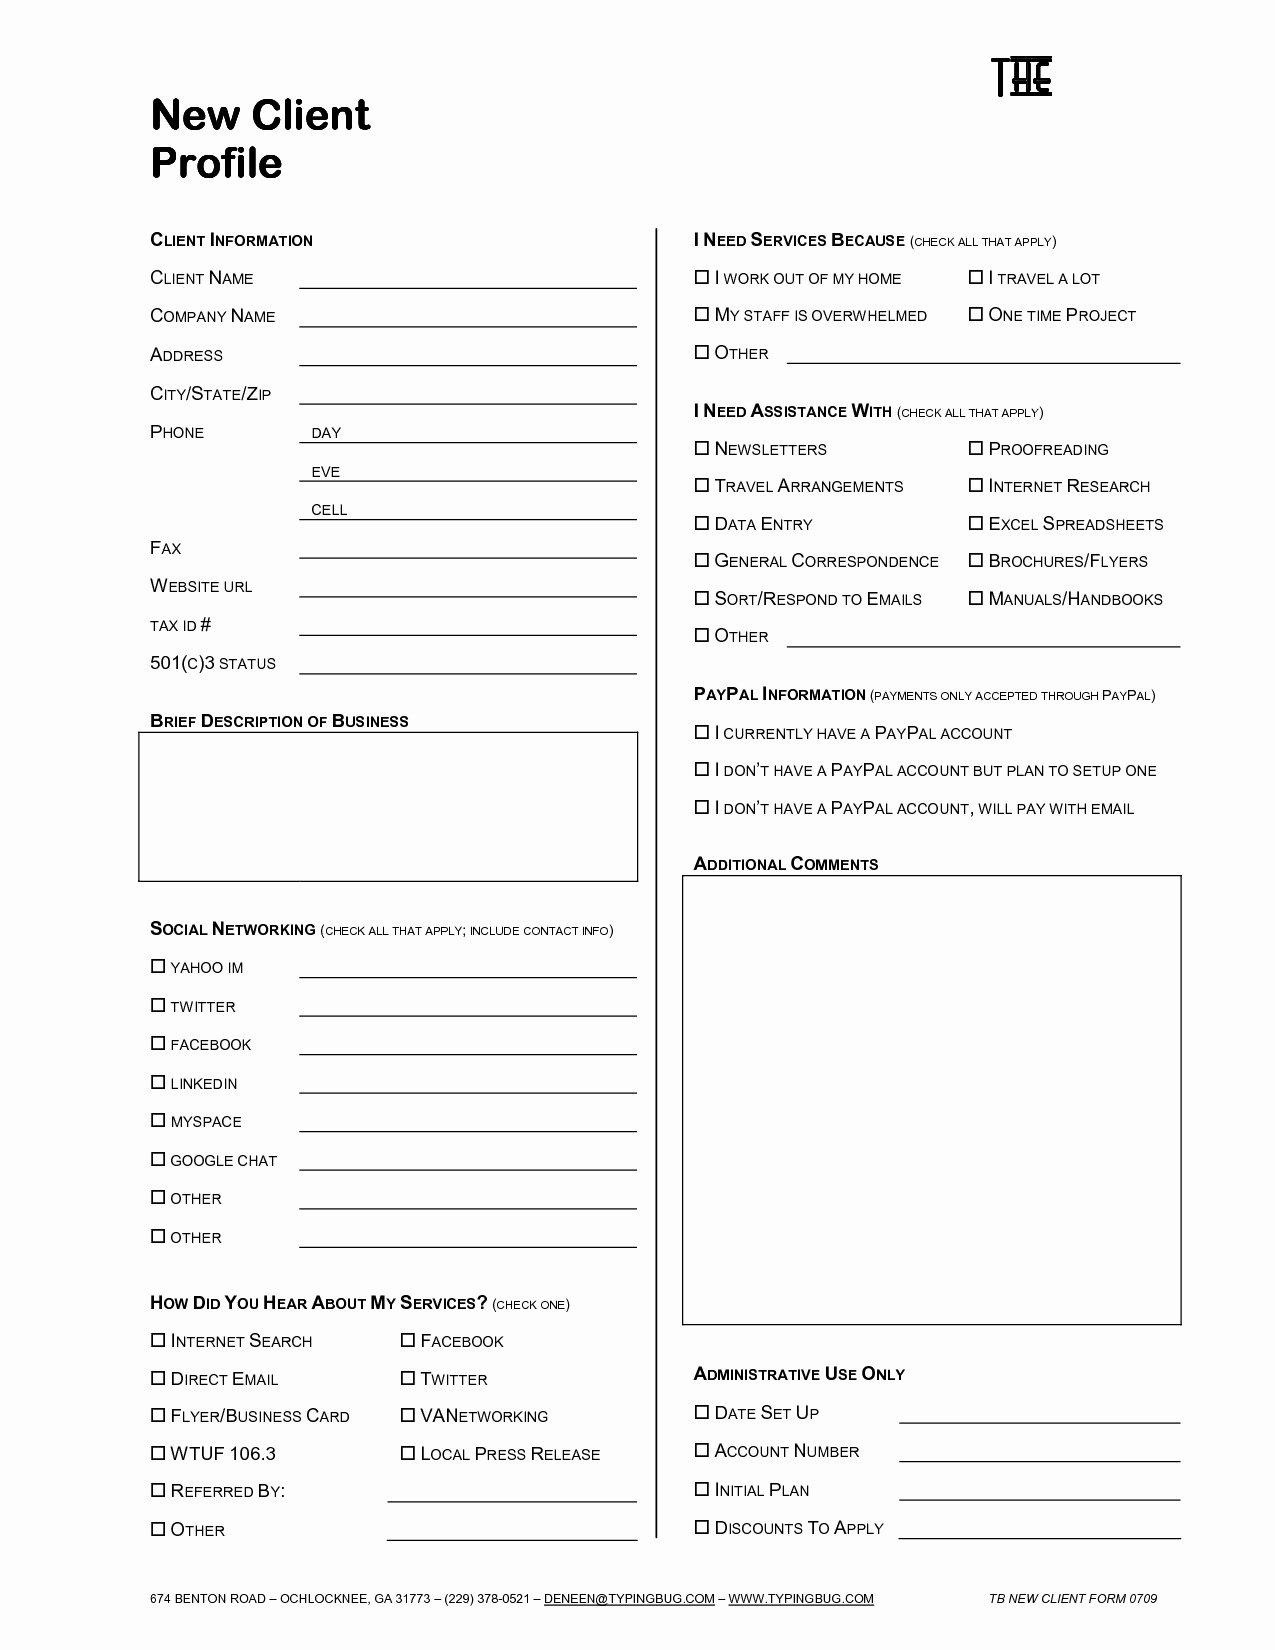 Customer Profile Template Excel Lovely Profile Sheet Template Portablegasgrillweber